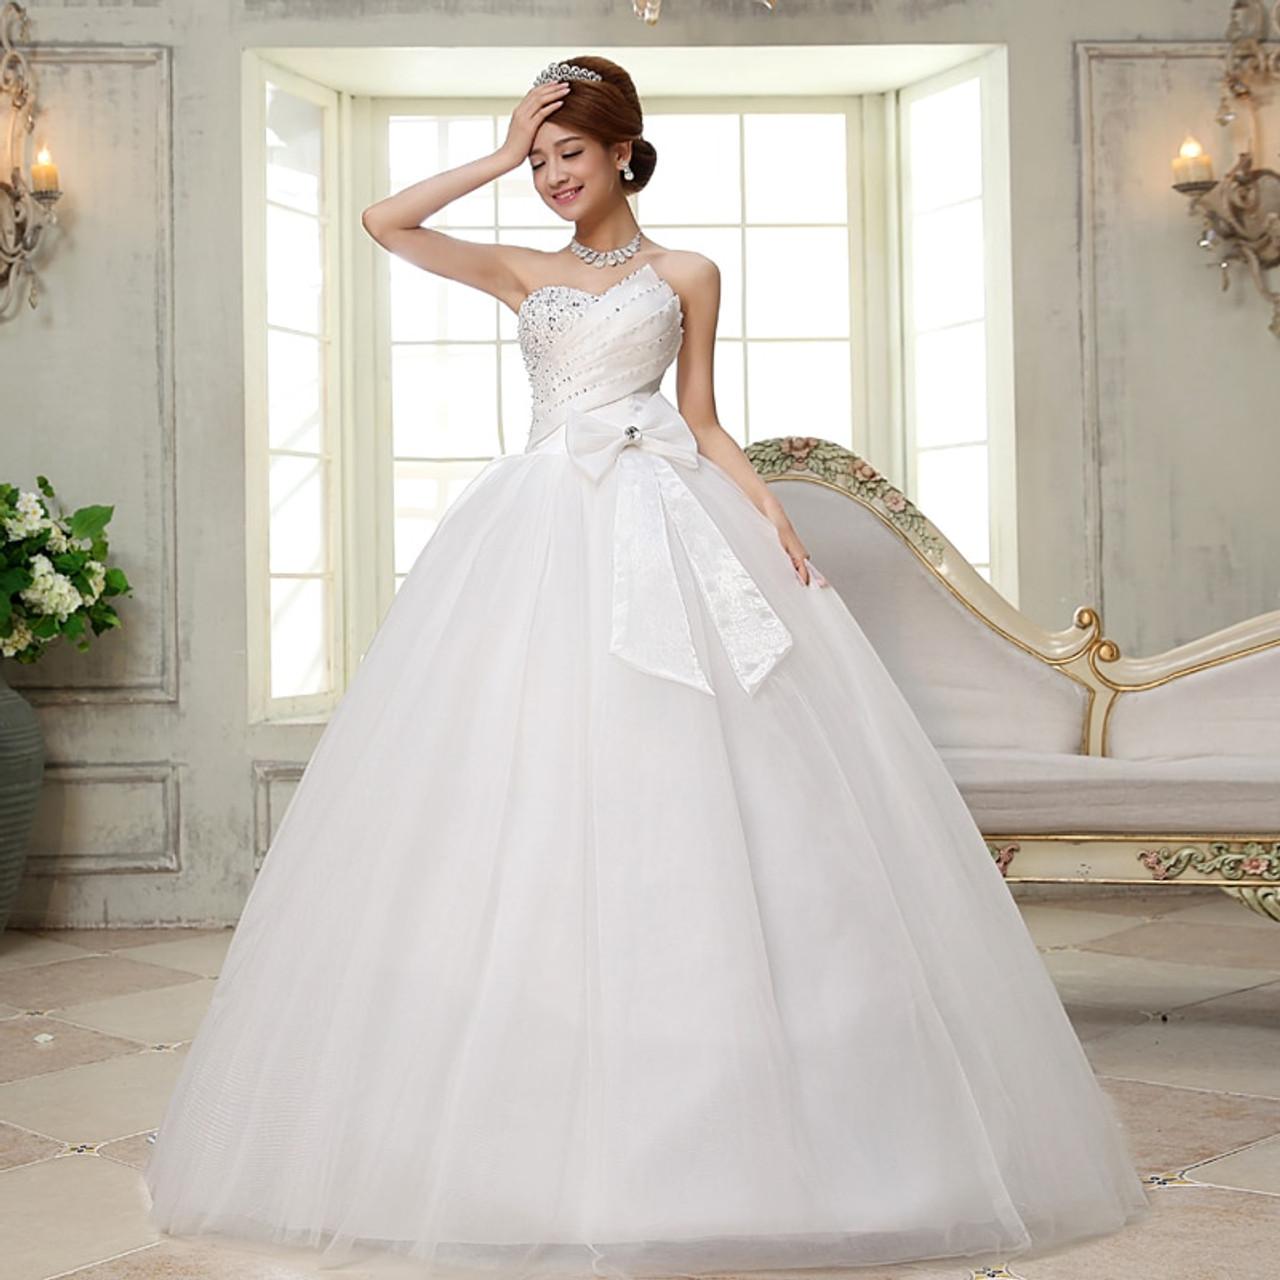 Lyg H27 Wholesale Plus Size Lace Up New Glass Diamond Bride Dresses Long Sweet Princess Wedding Dress 2019 Customize Wholesale Onshopdeals Com